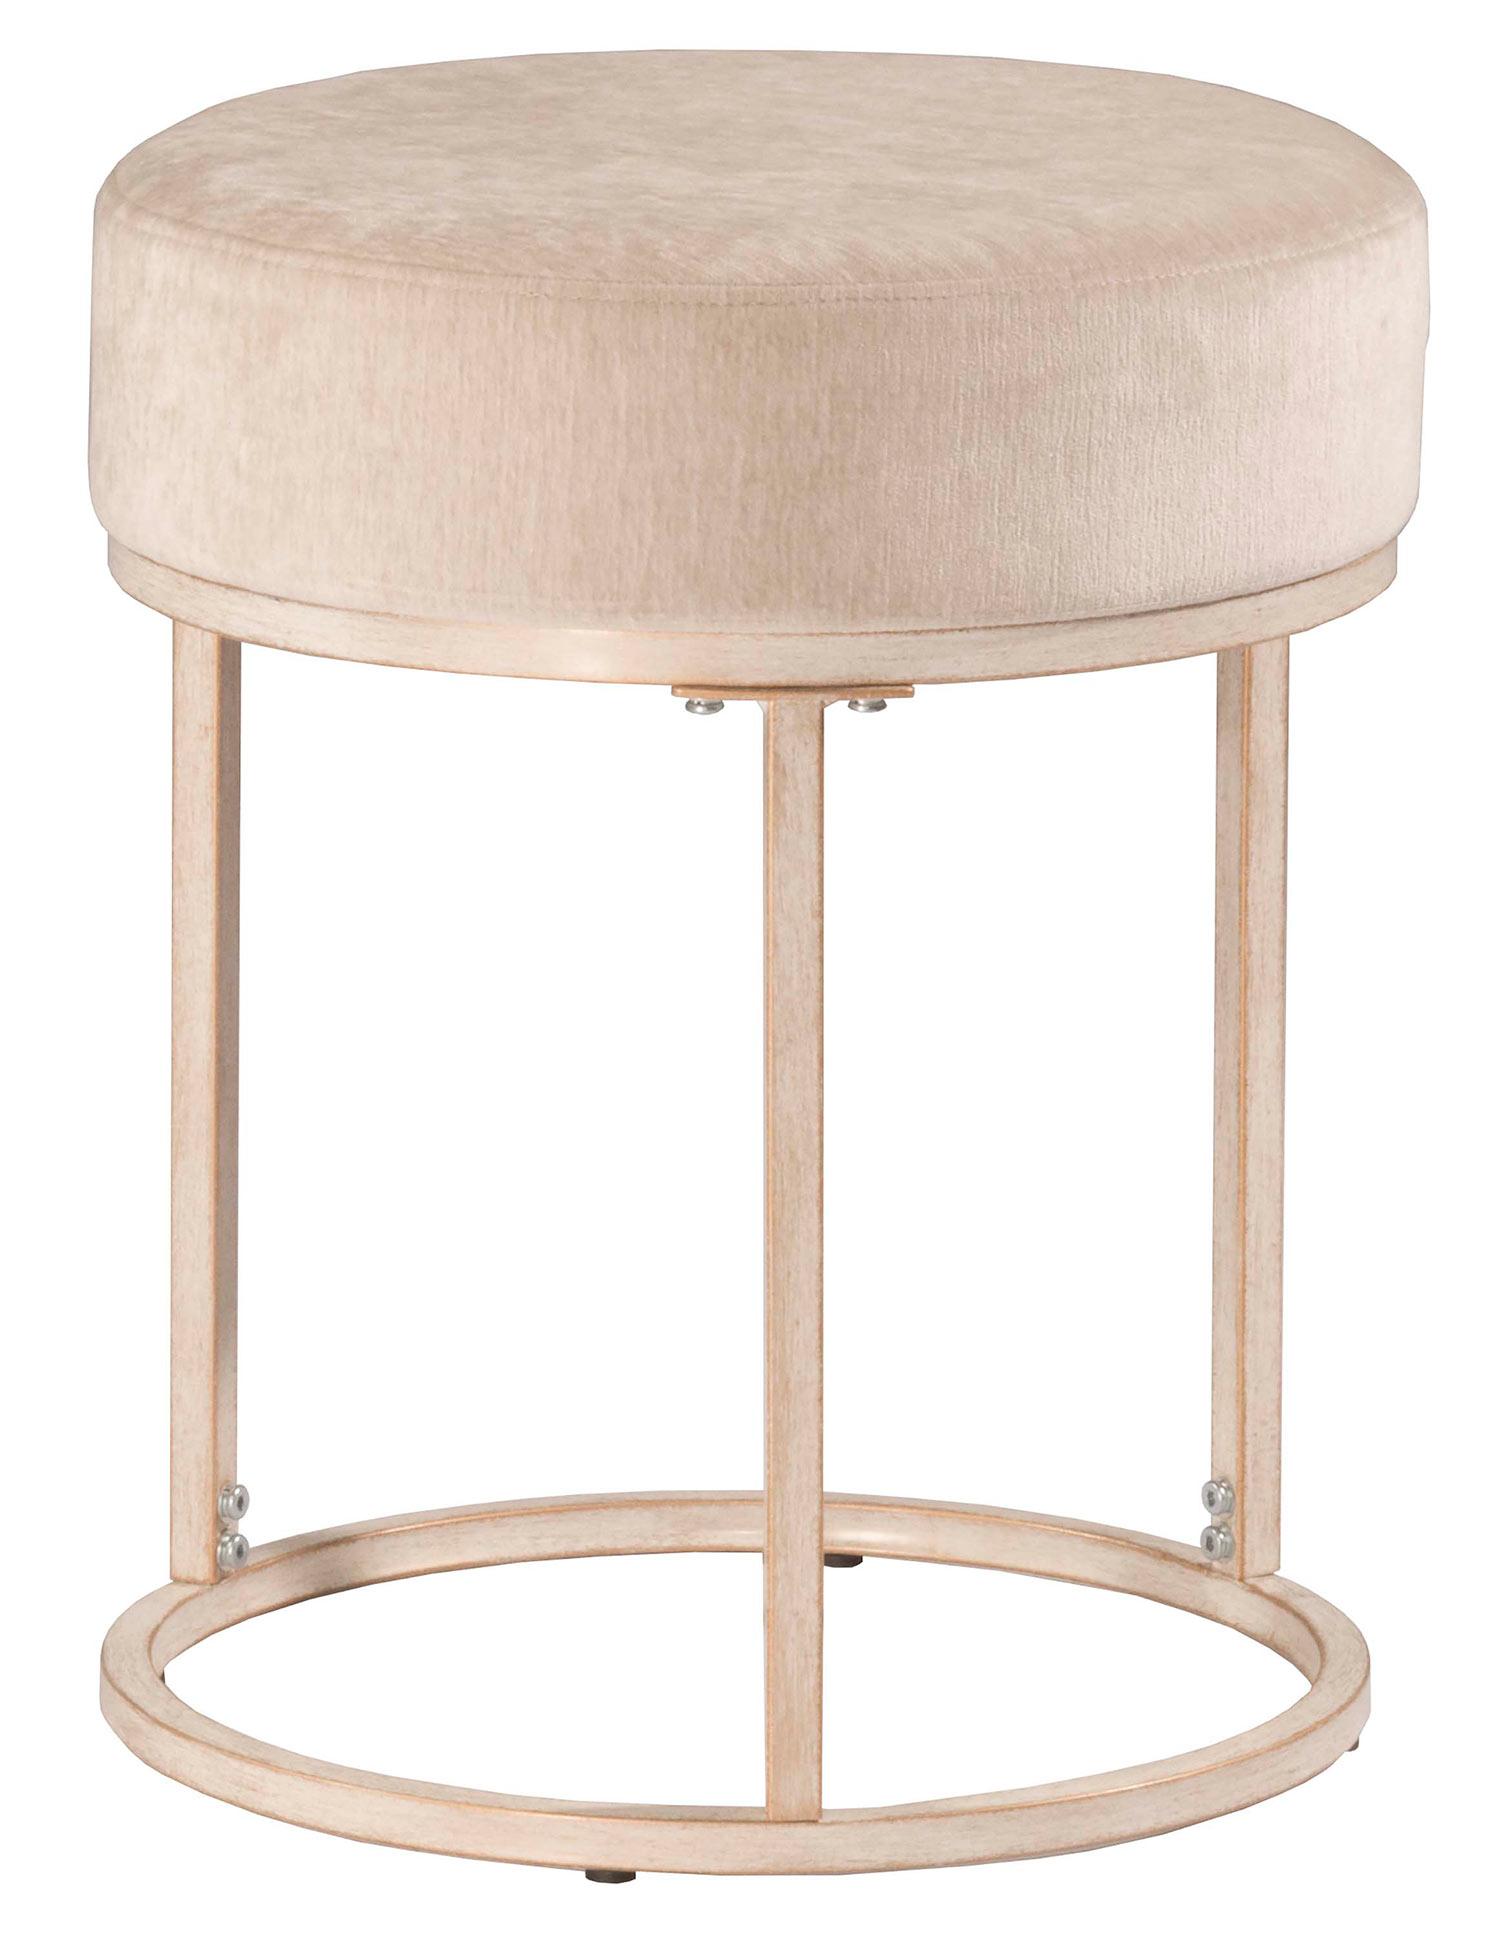 Fantastic Hillsdale Swanson Vanity Stool White Bone Fabric Creativecarmelina Interior Chair Design Creativecarmelinacom